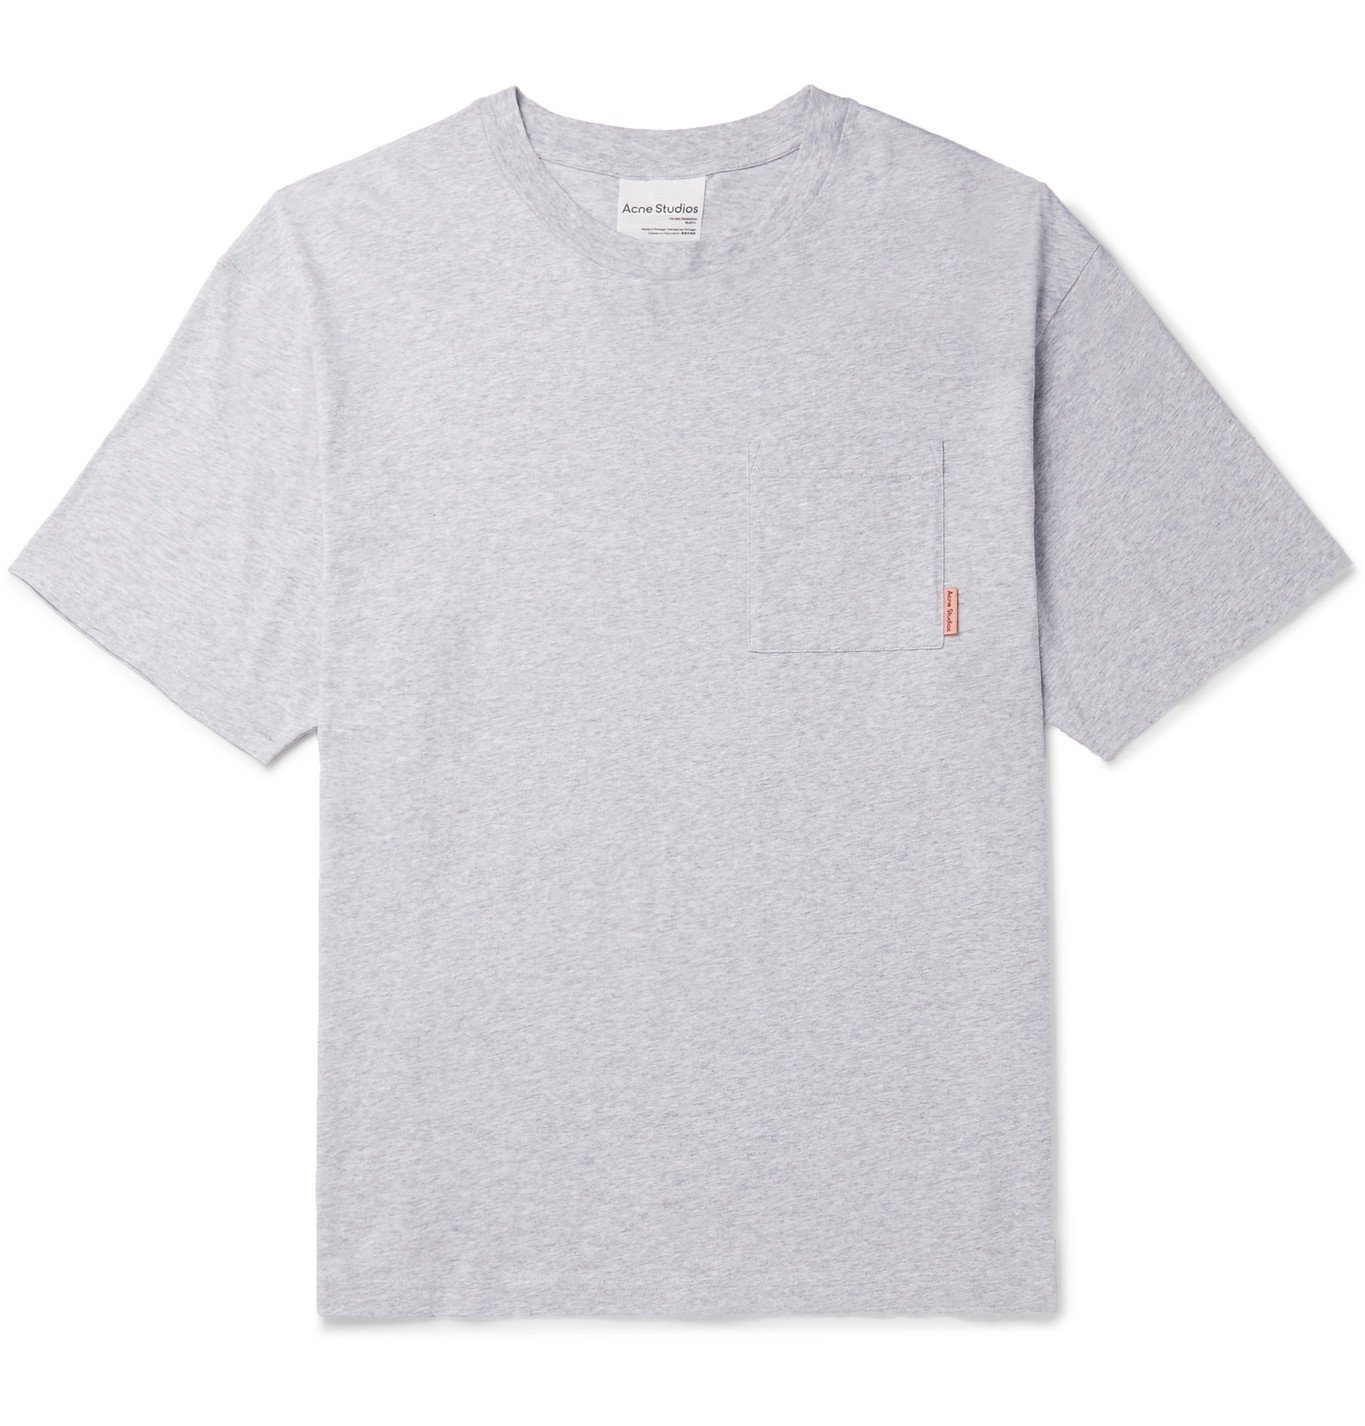 Acne Studios - Oversized Cotton-Jersey T-Shirt - Gray